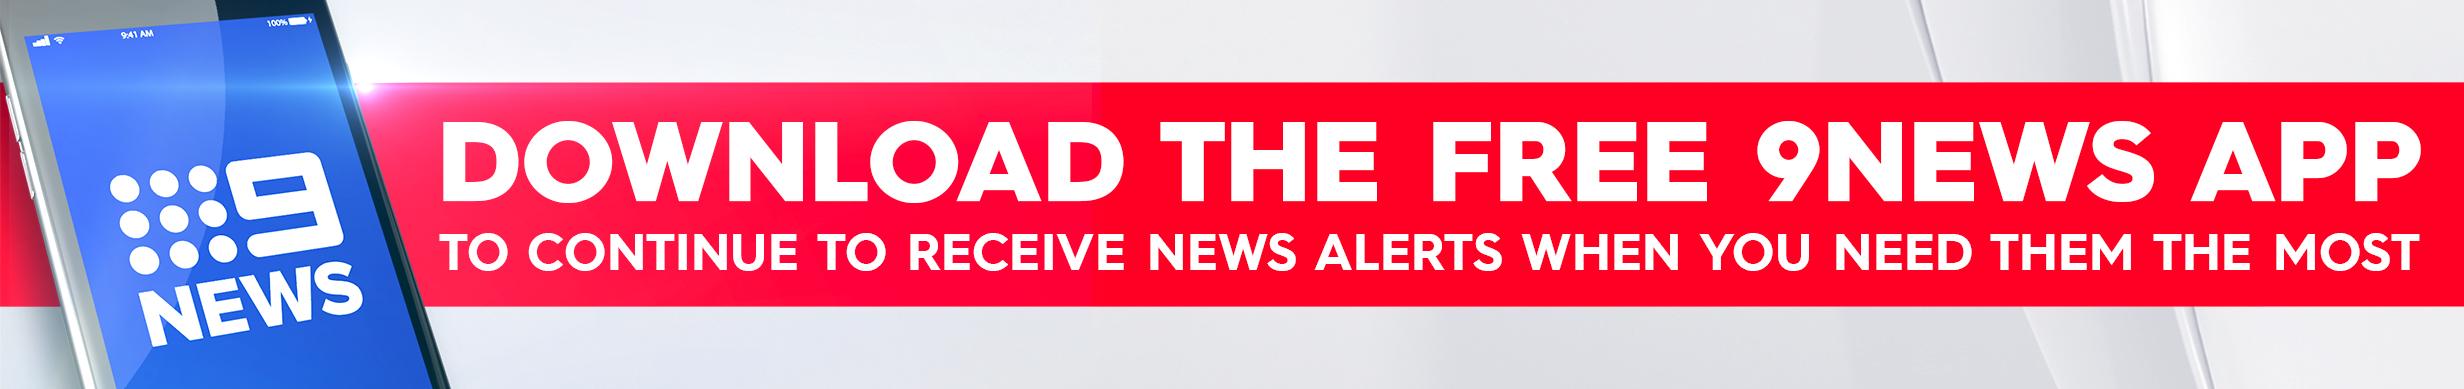 Hyperlink here https://www.9news.com.au/national/how-to-follow-9news-digital/29855bb1-ad3d-4c38-bc25-3cb52af1216f